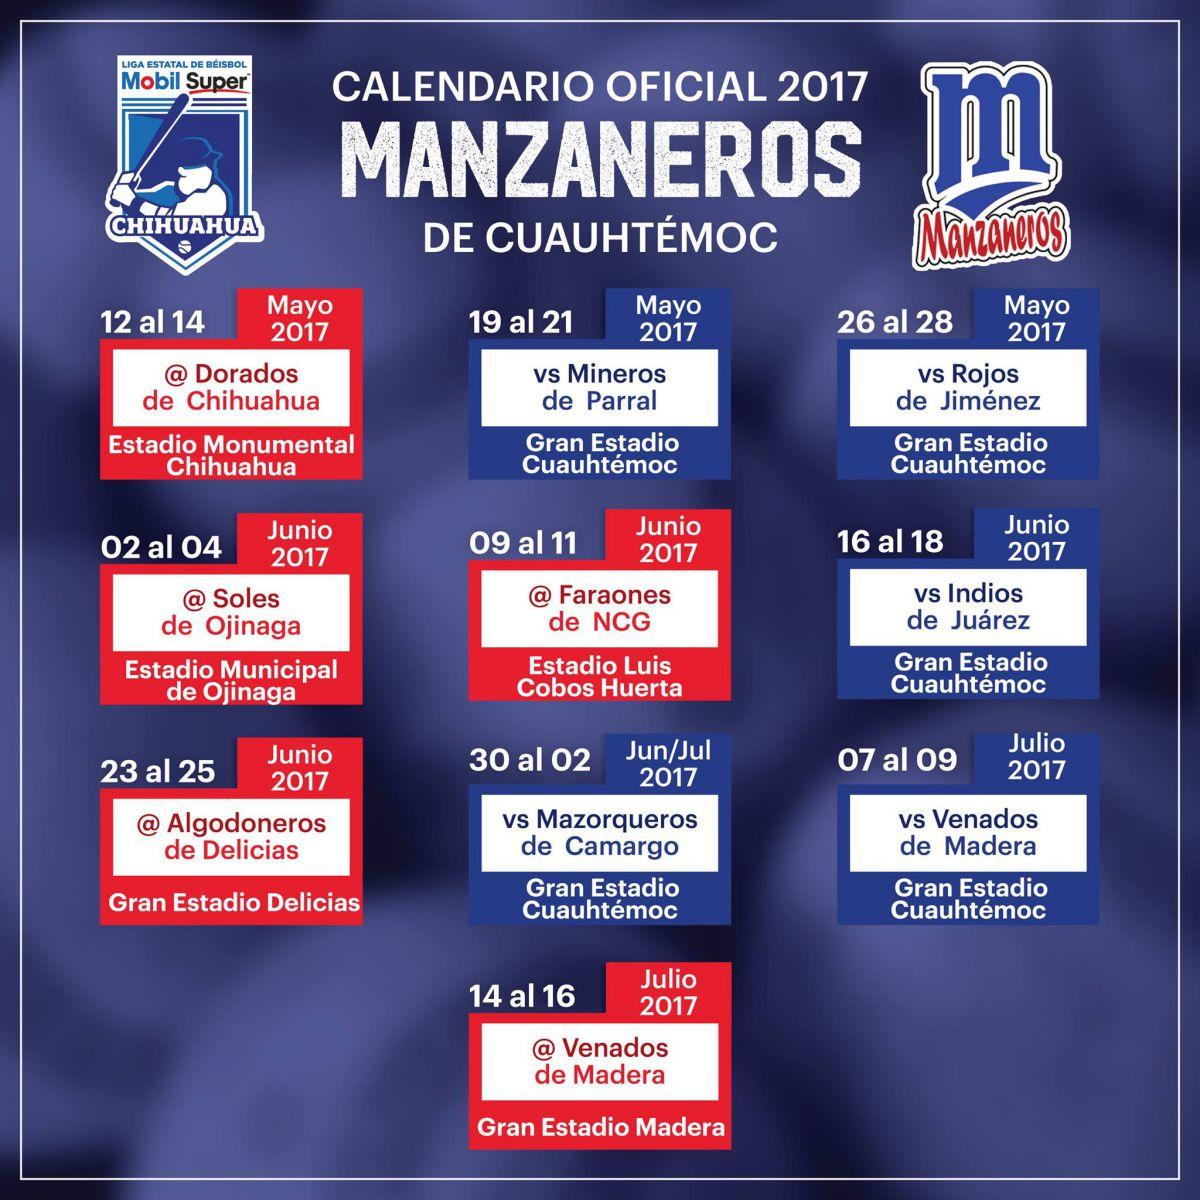 manzaneros calendario beisbol chihuahua 2017